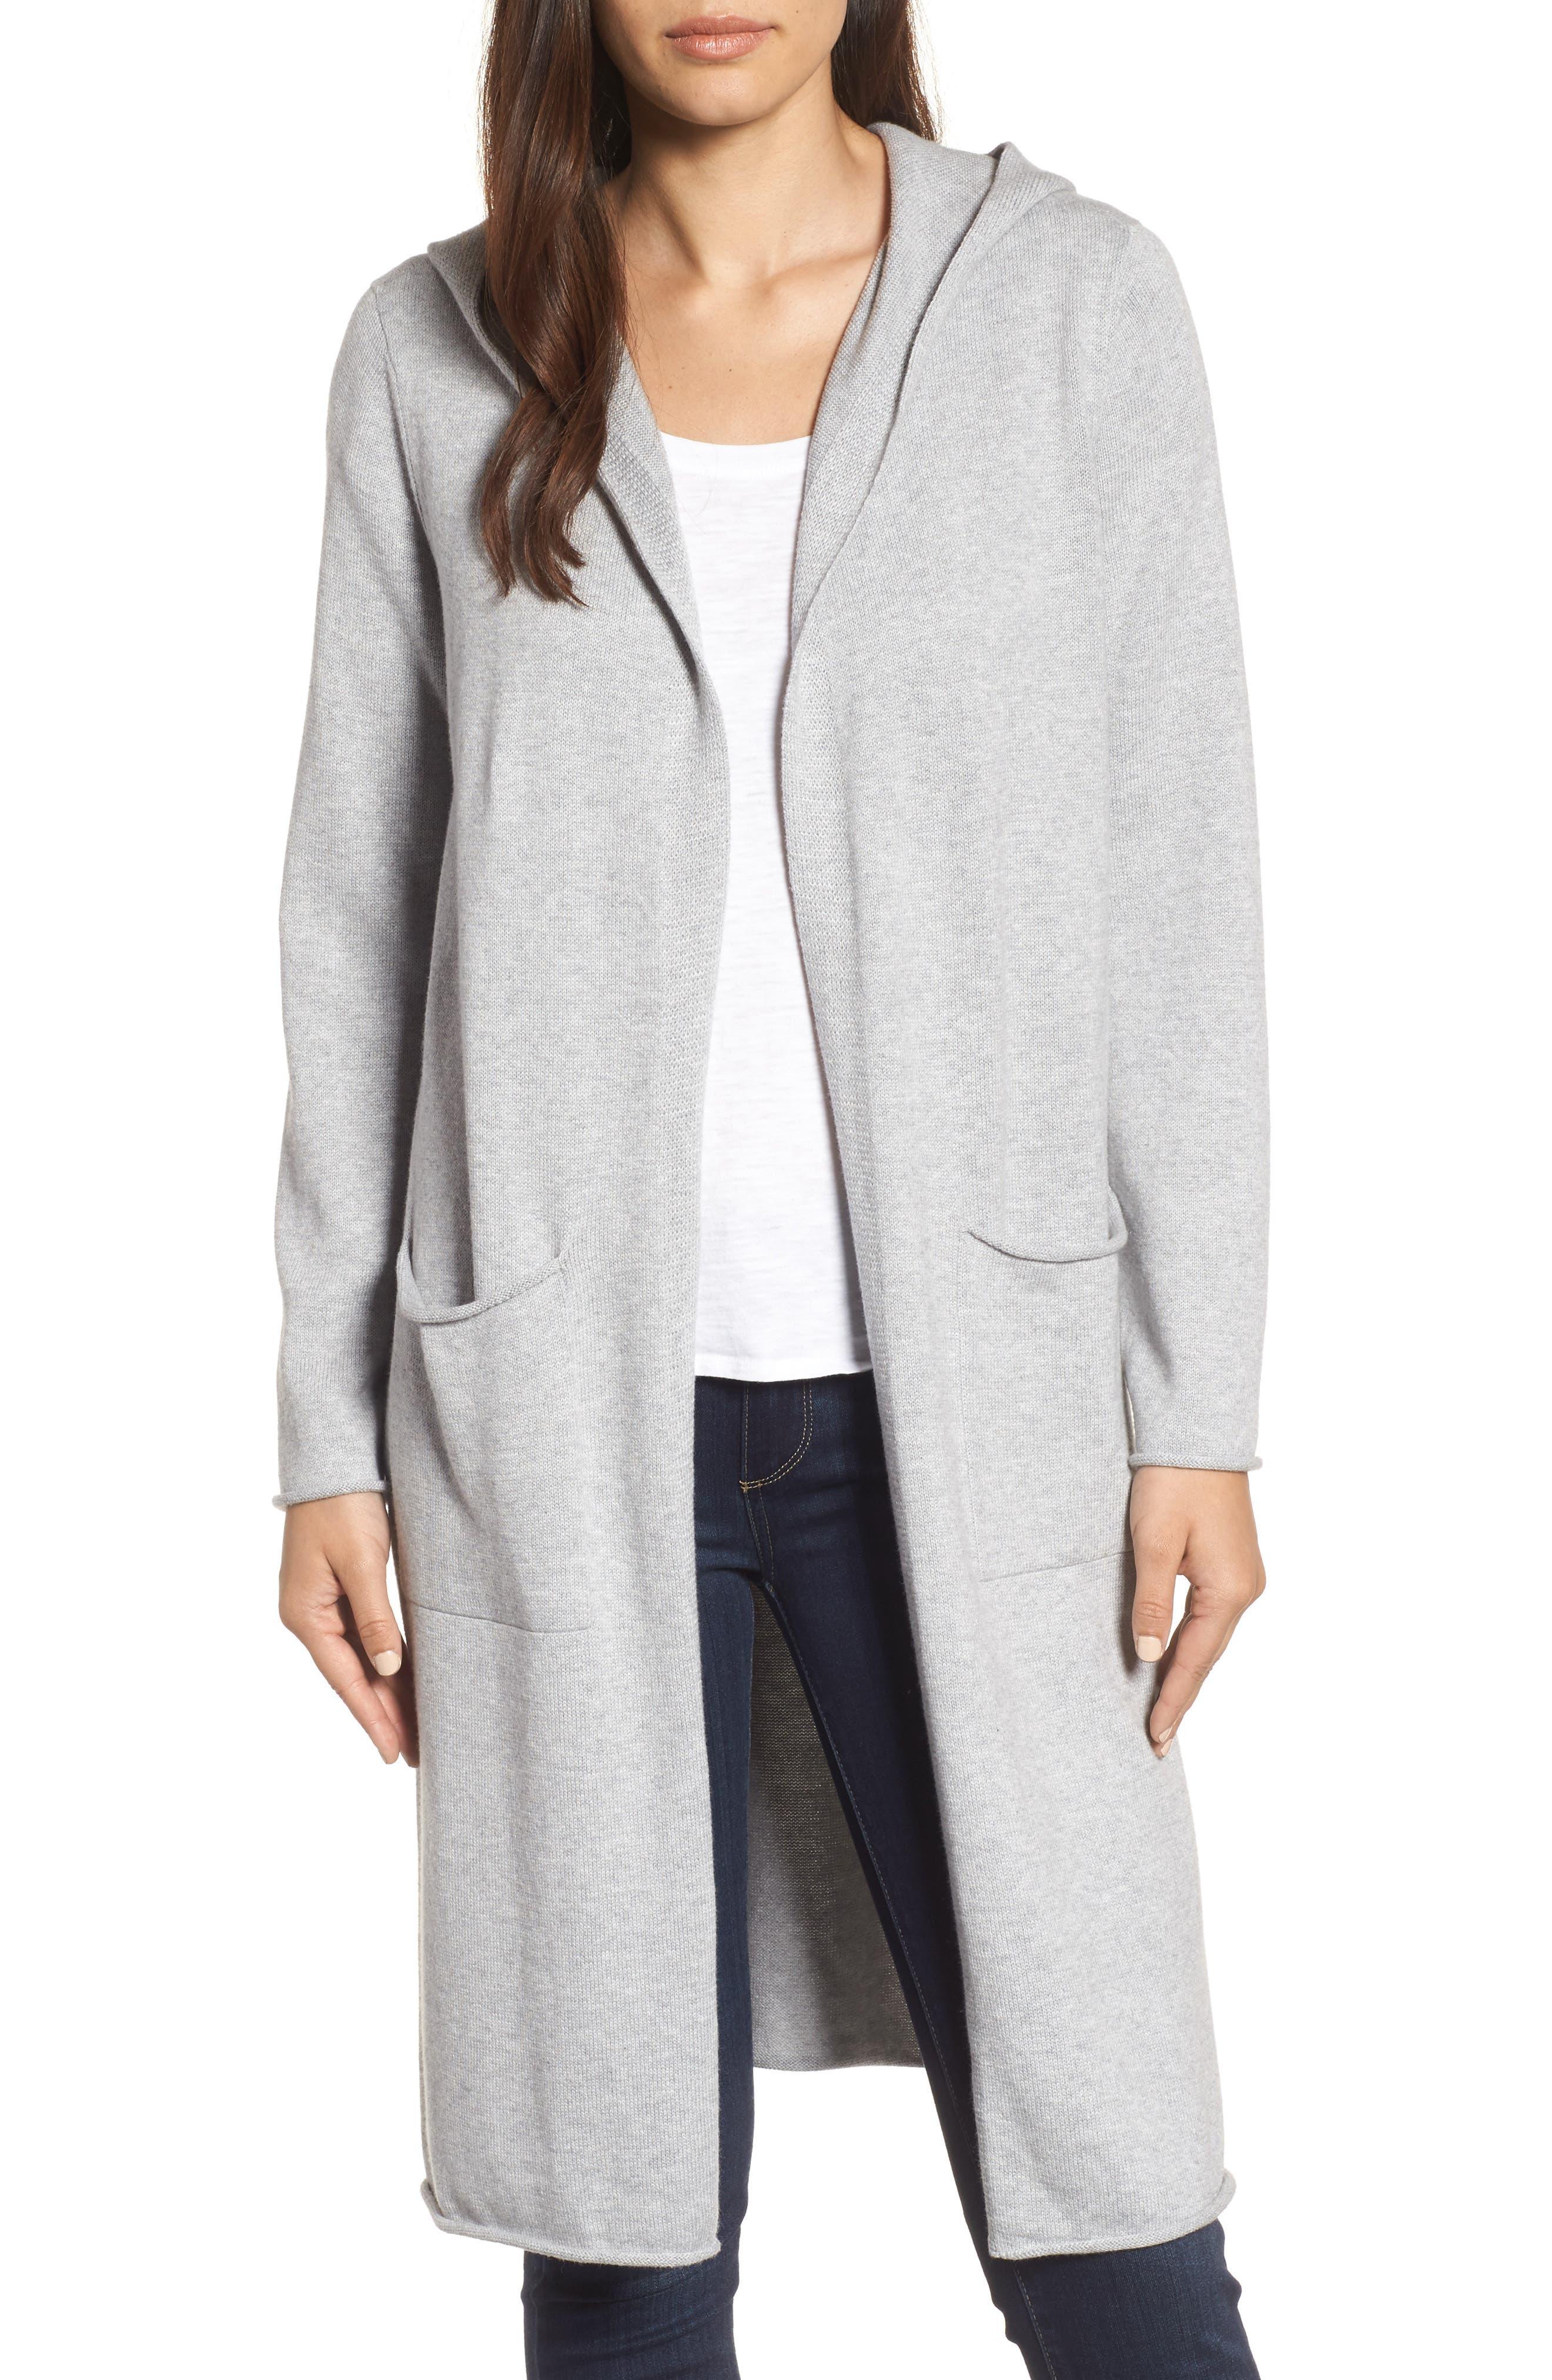 Organic Cotton Hooded Cardigan,                         Main,                         color, 022